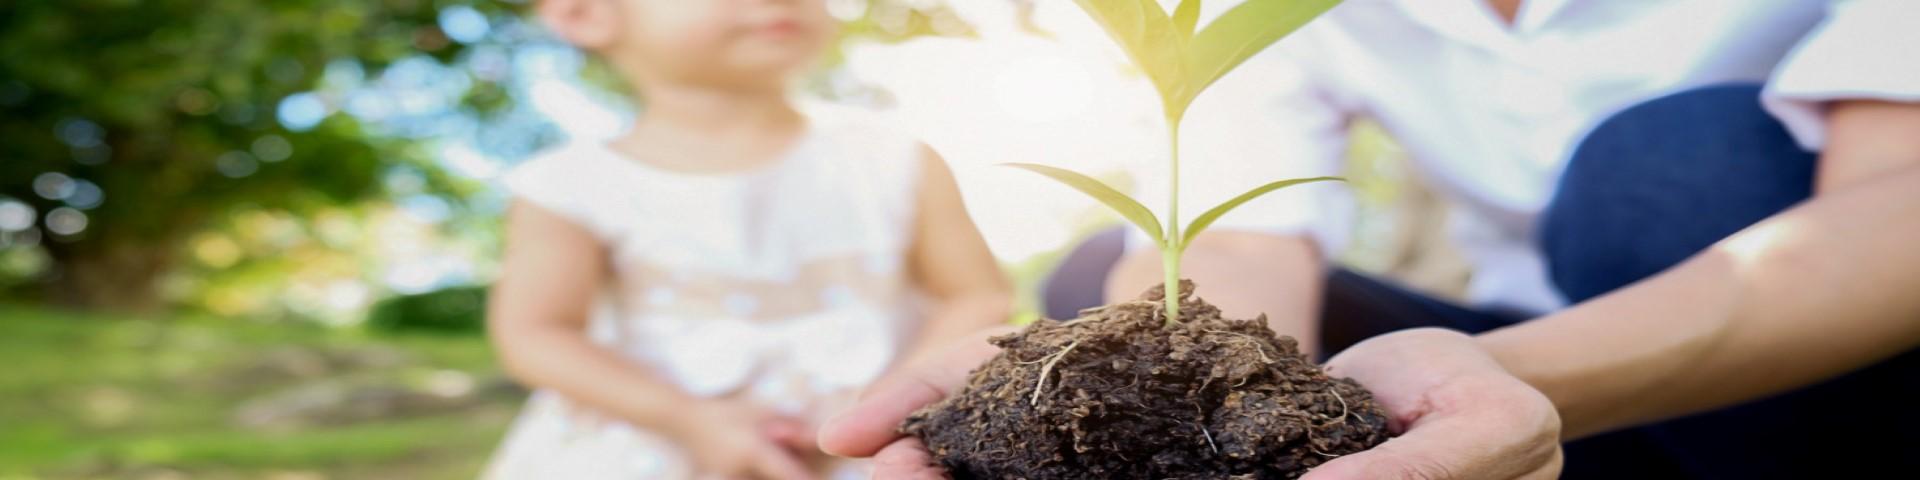 sustainable plant child 1920x480